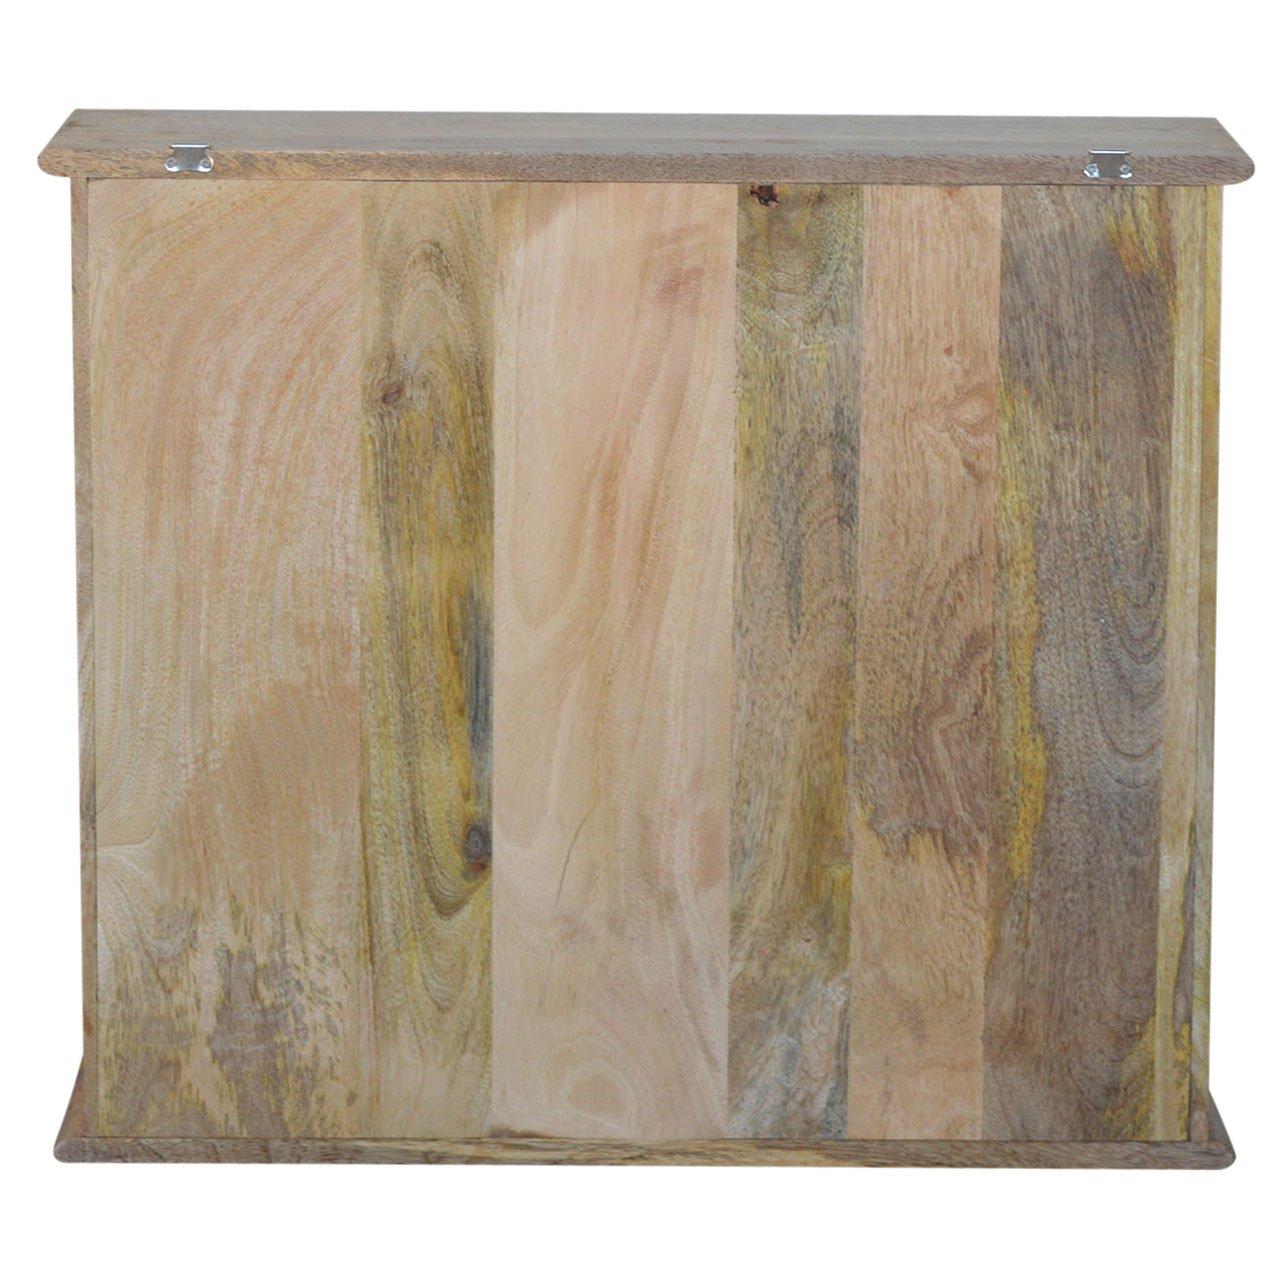 Artisan Furniture Hook /& Hide Wall Mounted Unit Wood Natural Oak//Ish Finish